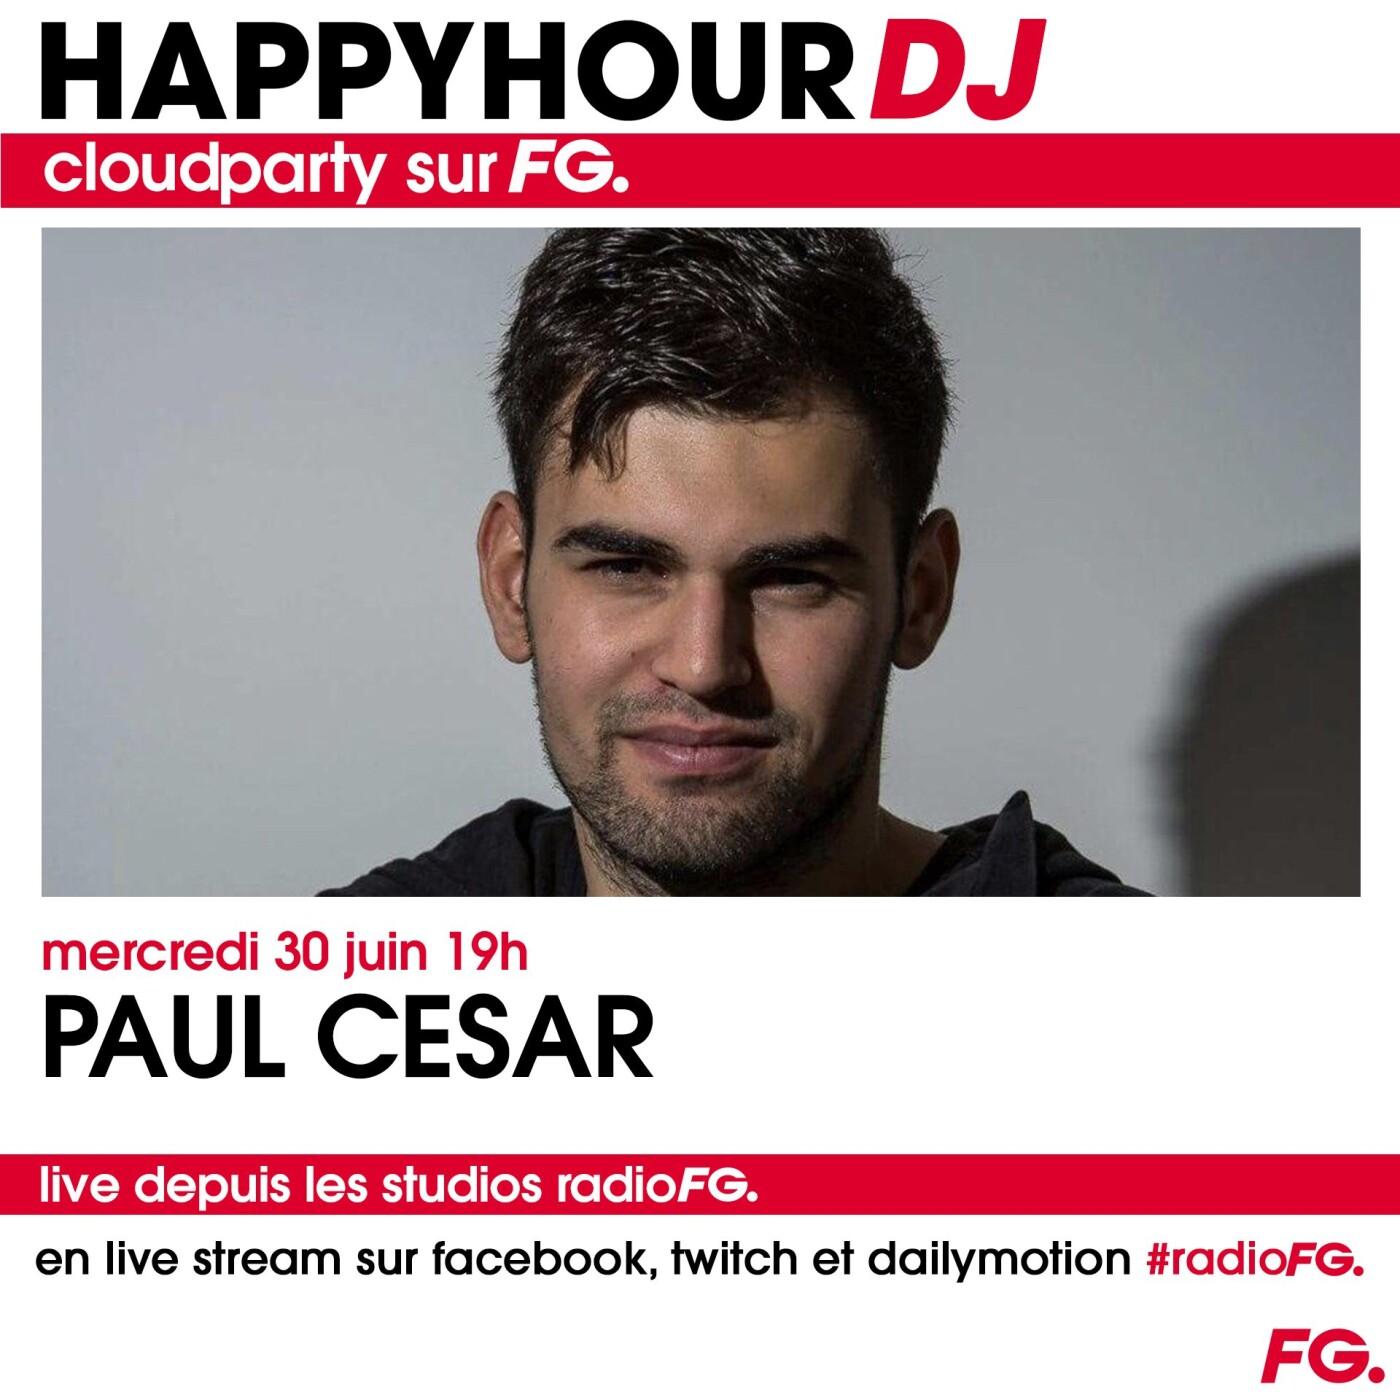 HAPPY HOUR DJ : PAUL CESAR